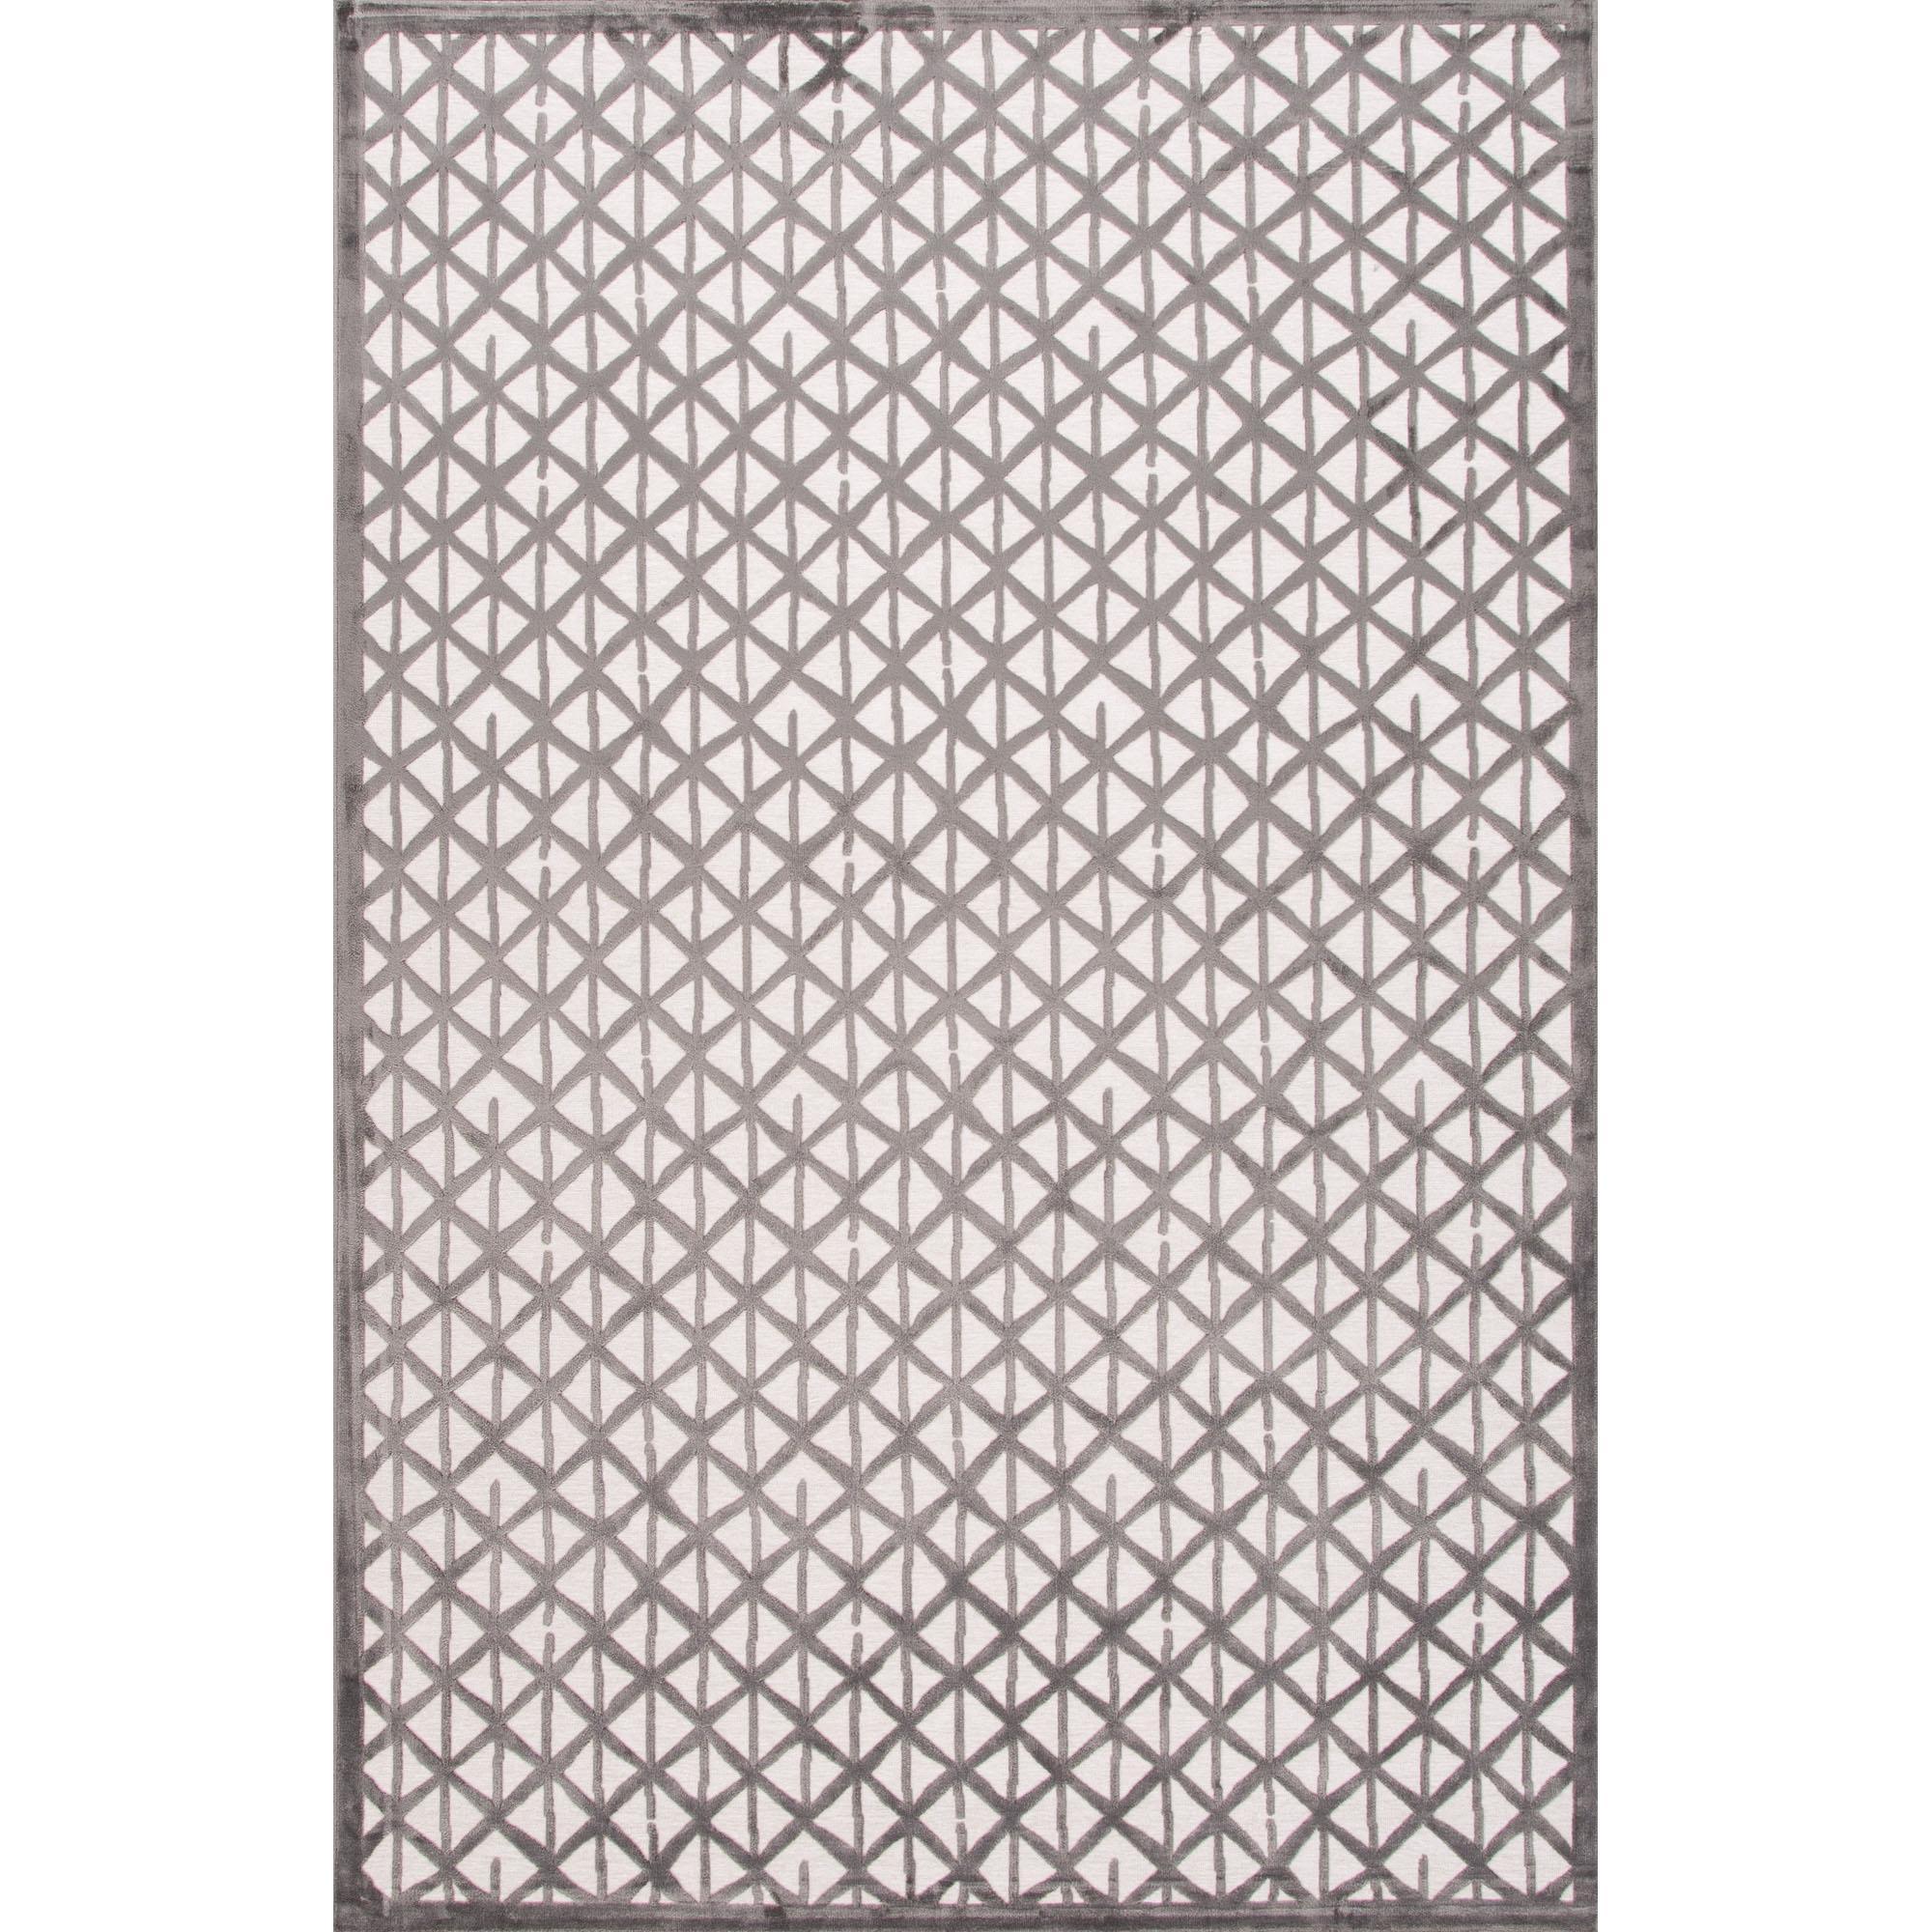 JAIPUR Rugs Fables 9 x 12 Rug - Item Number: RUG111940